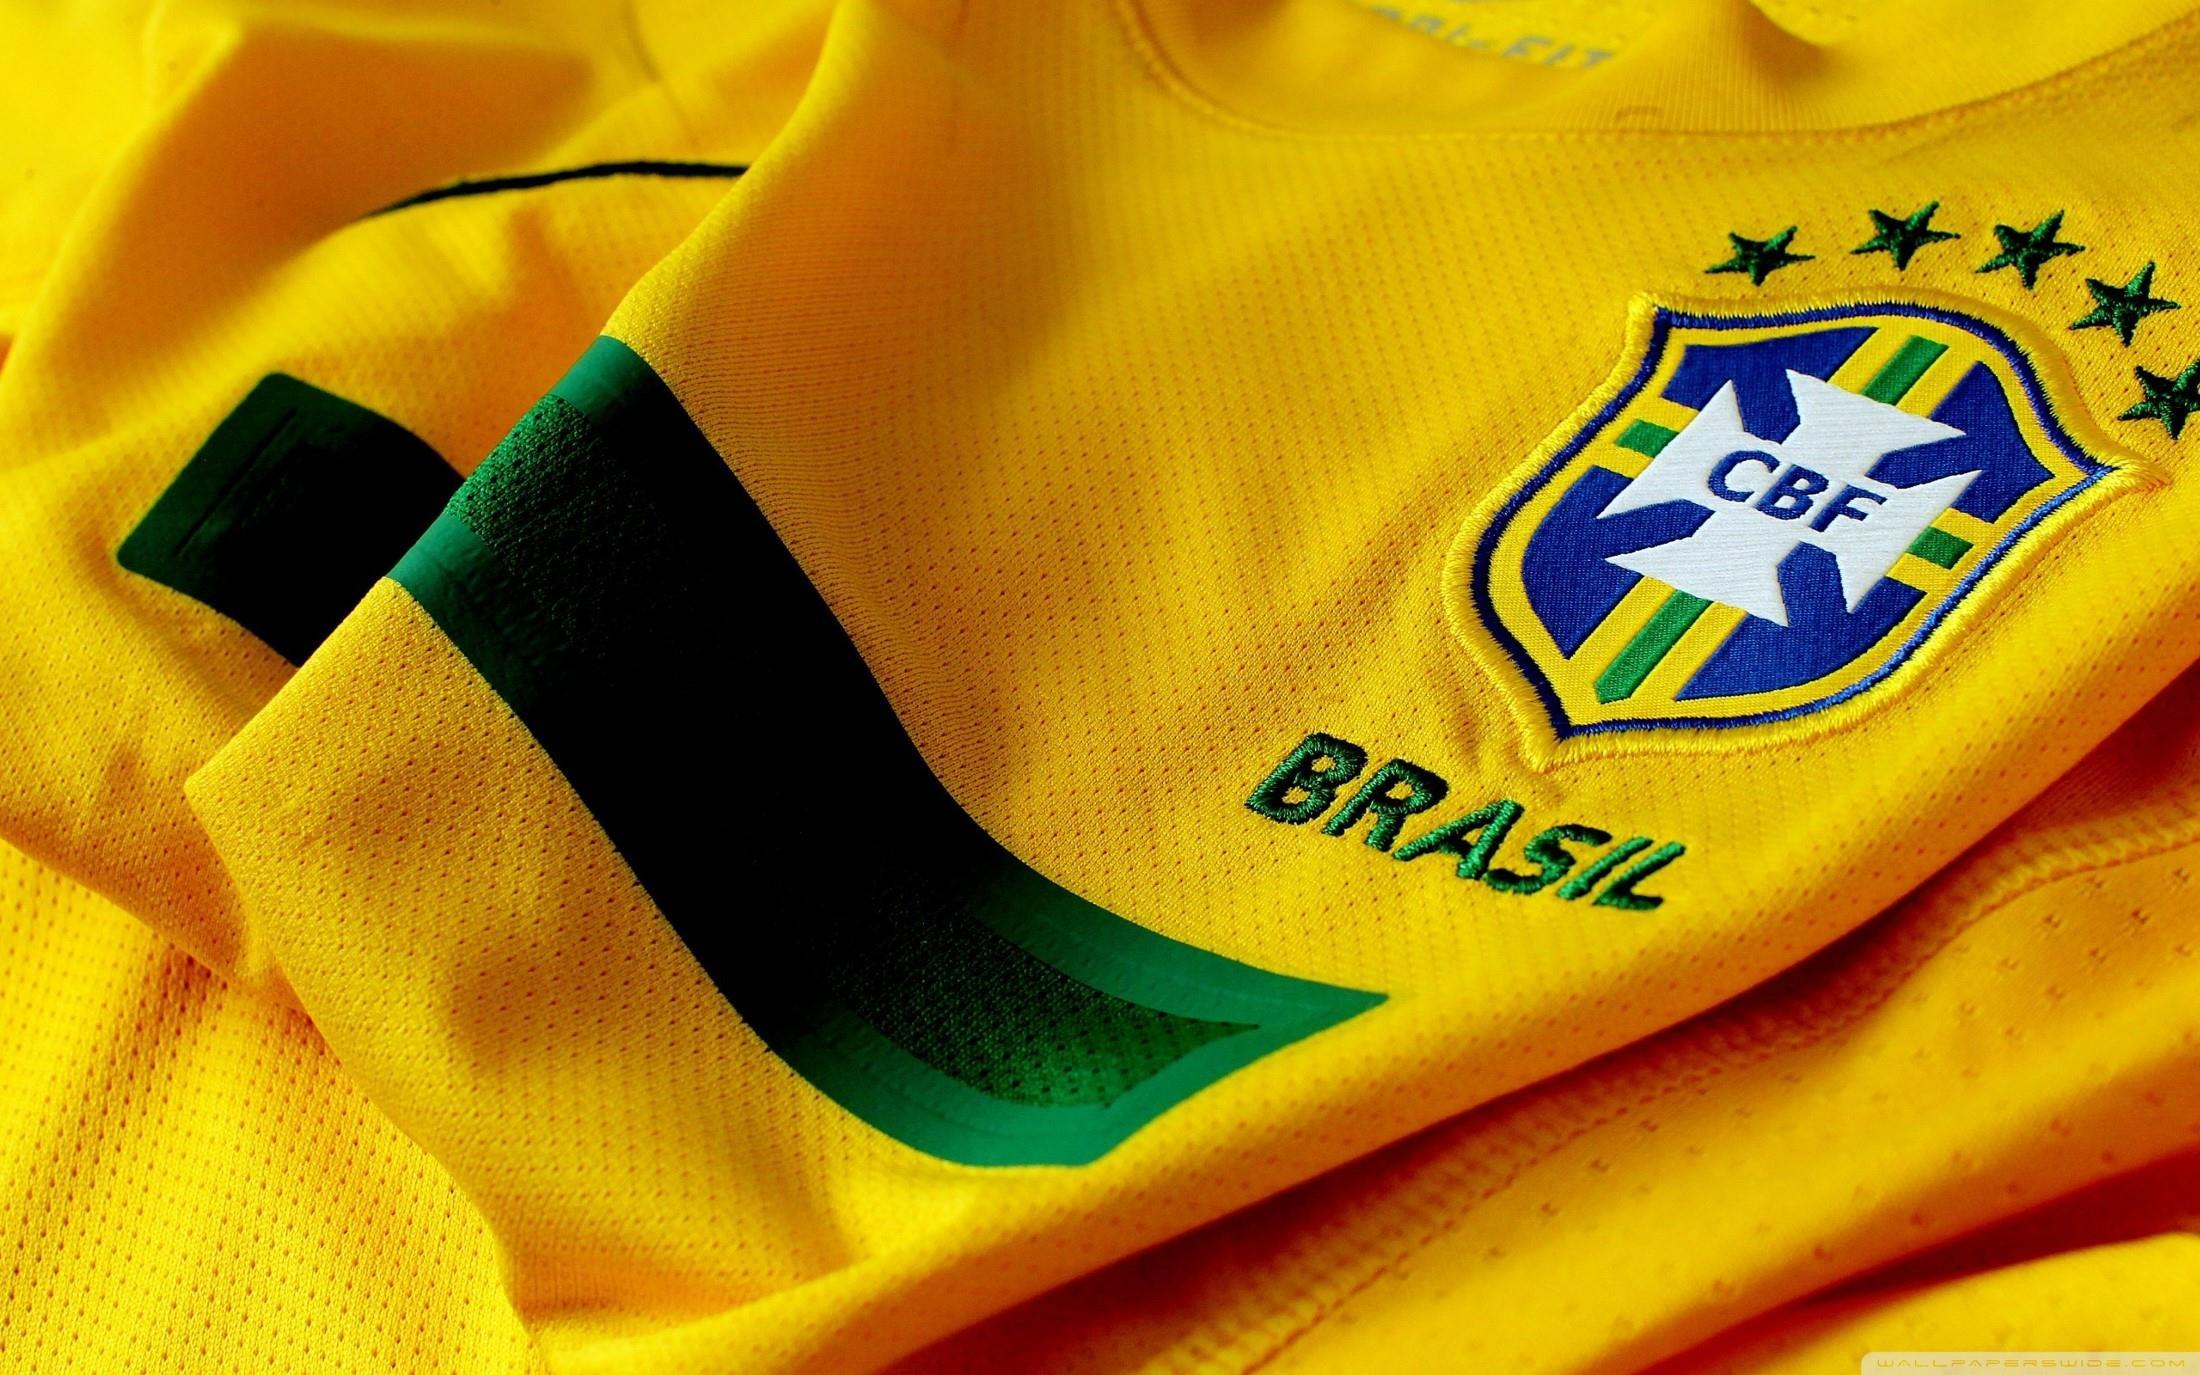 maillot-jaune-equipe-du-bresil-coupe-du-monde-2014